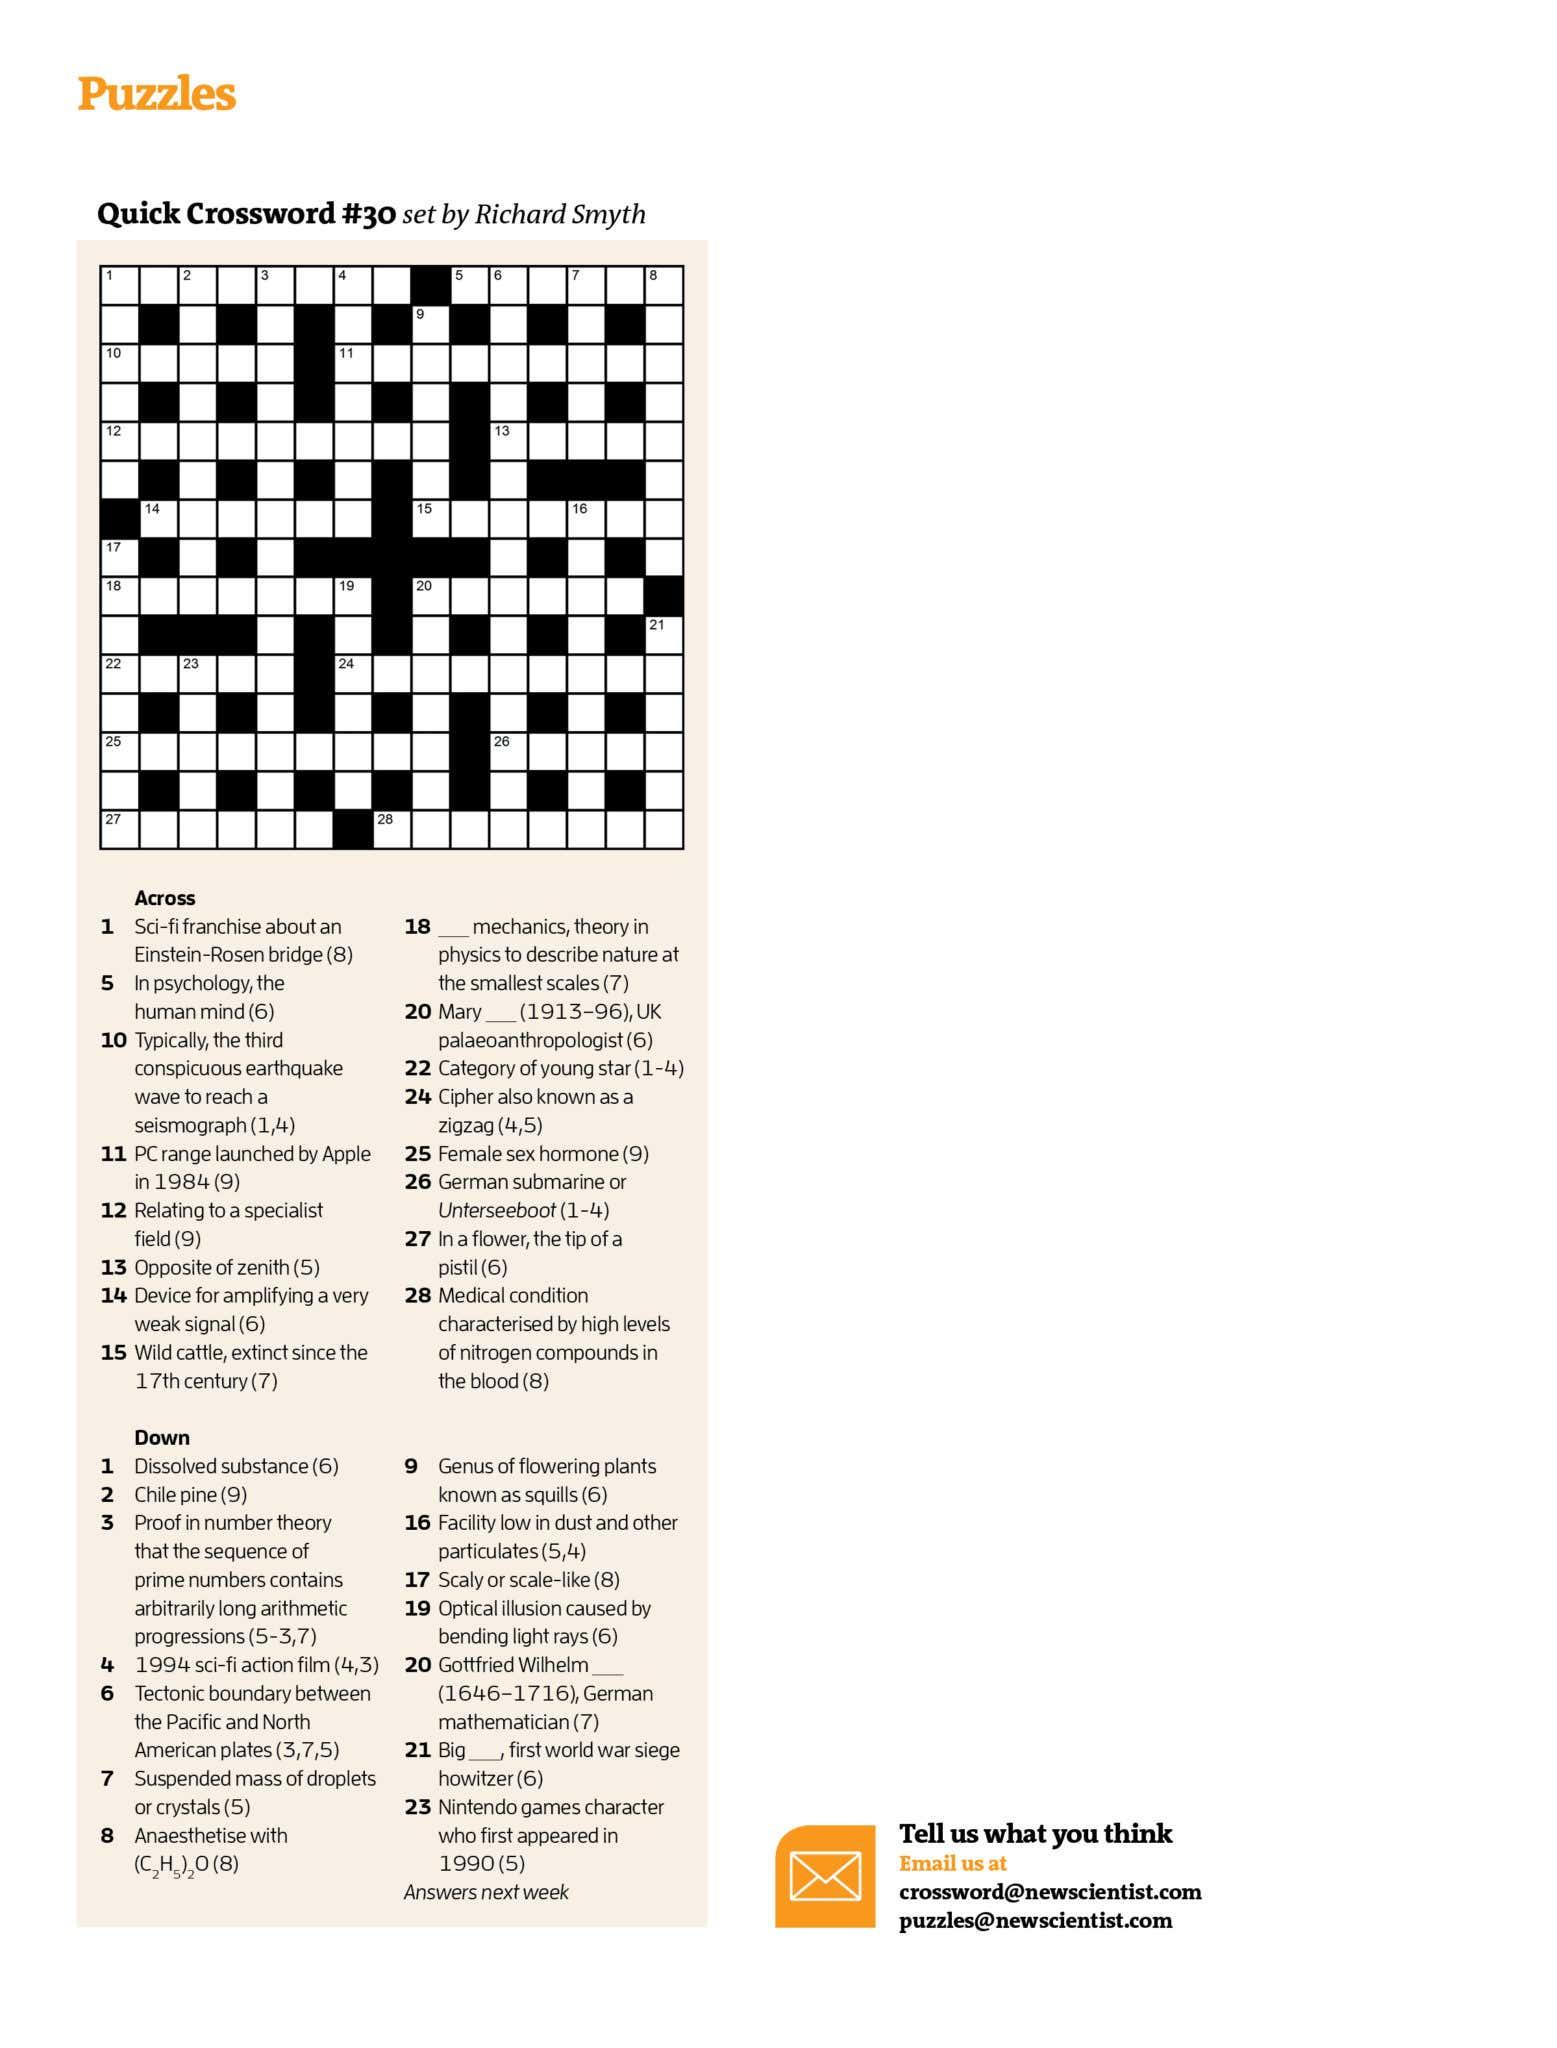 Quick Crossword #30 | New Scientist - Printable Quick Crossword